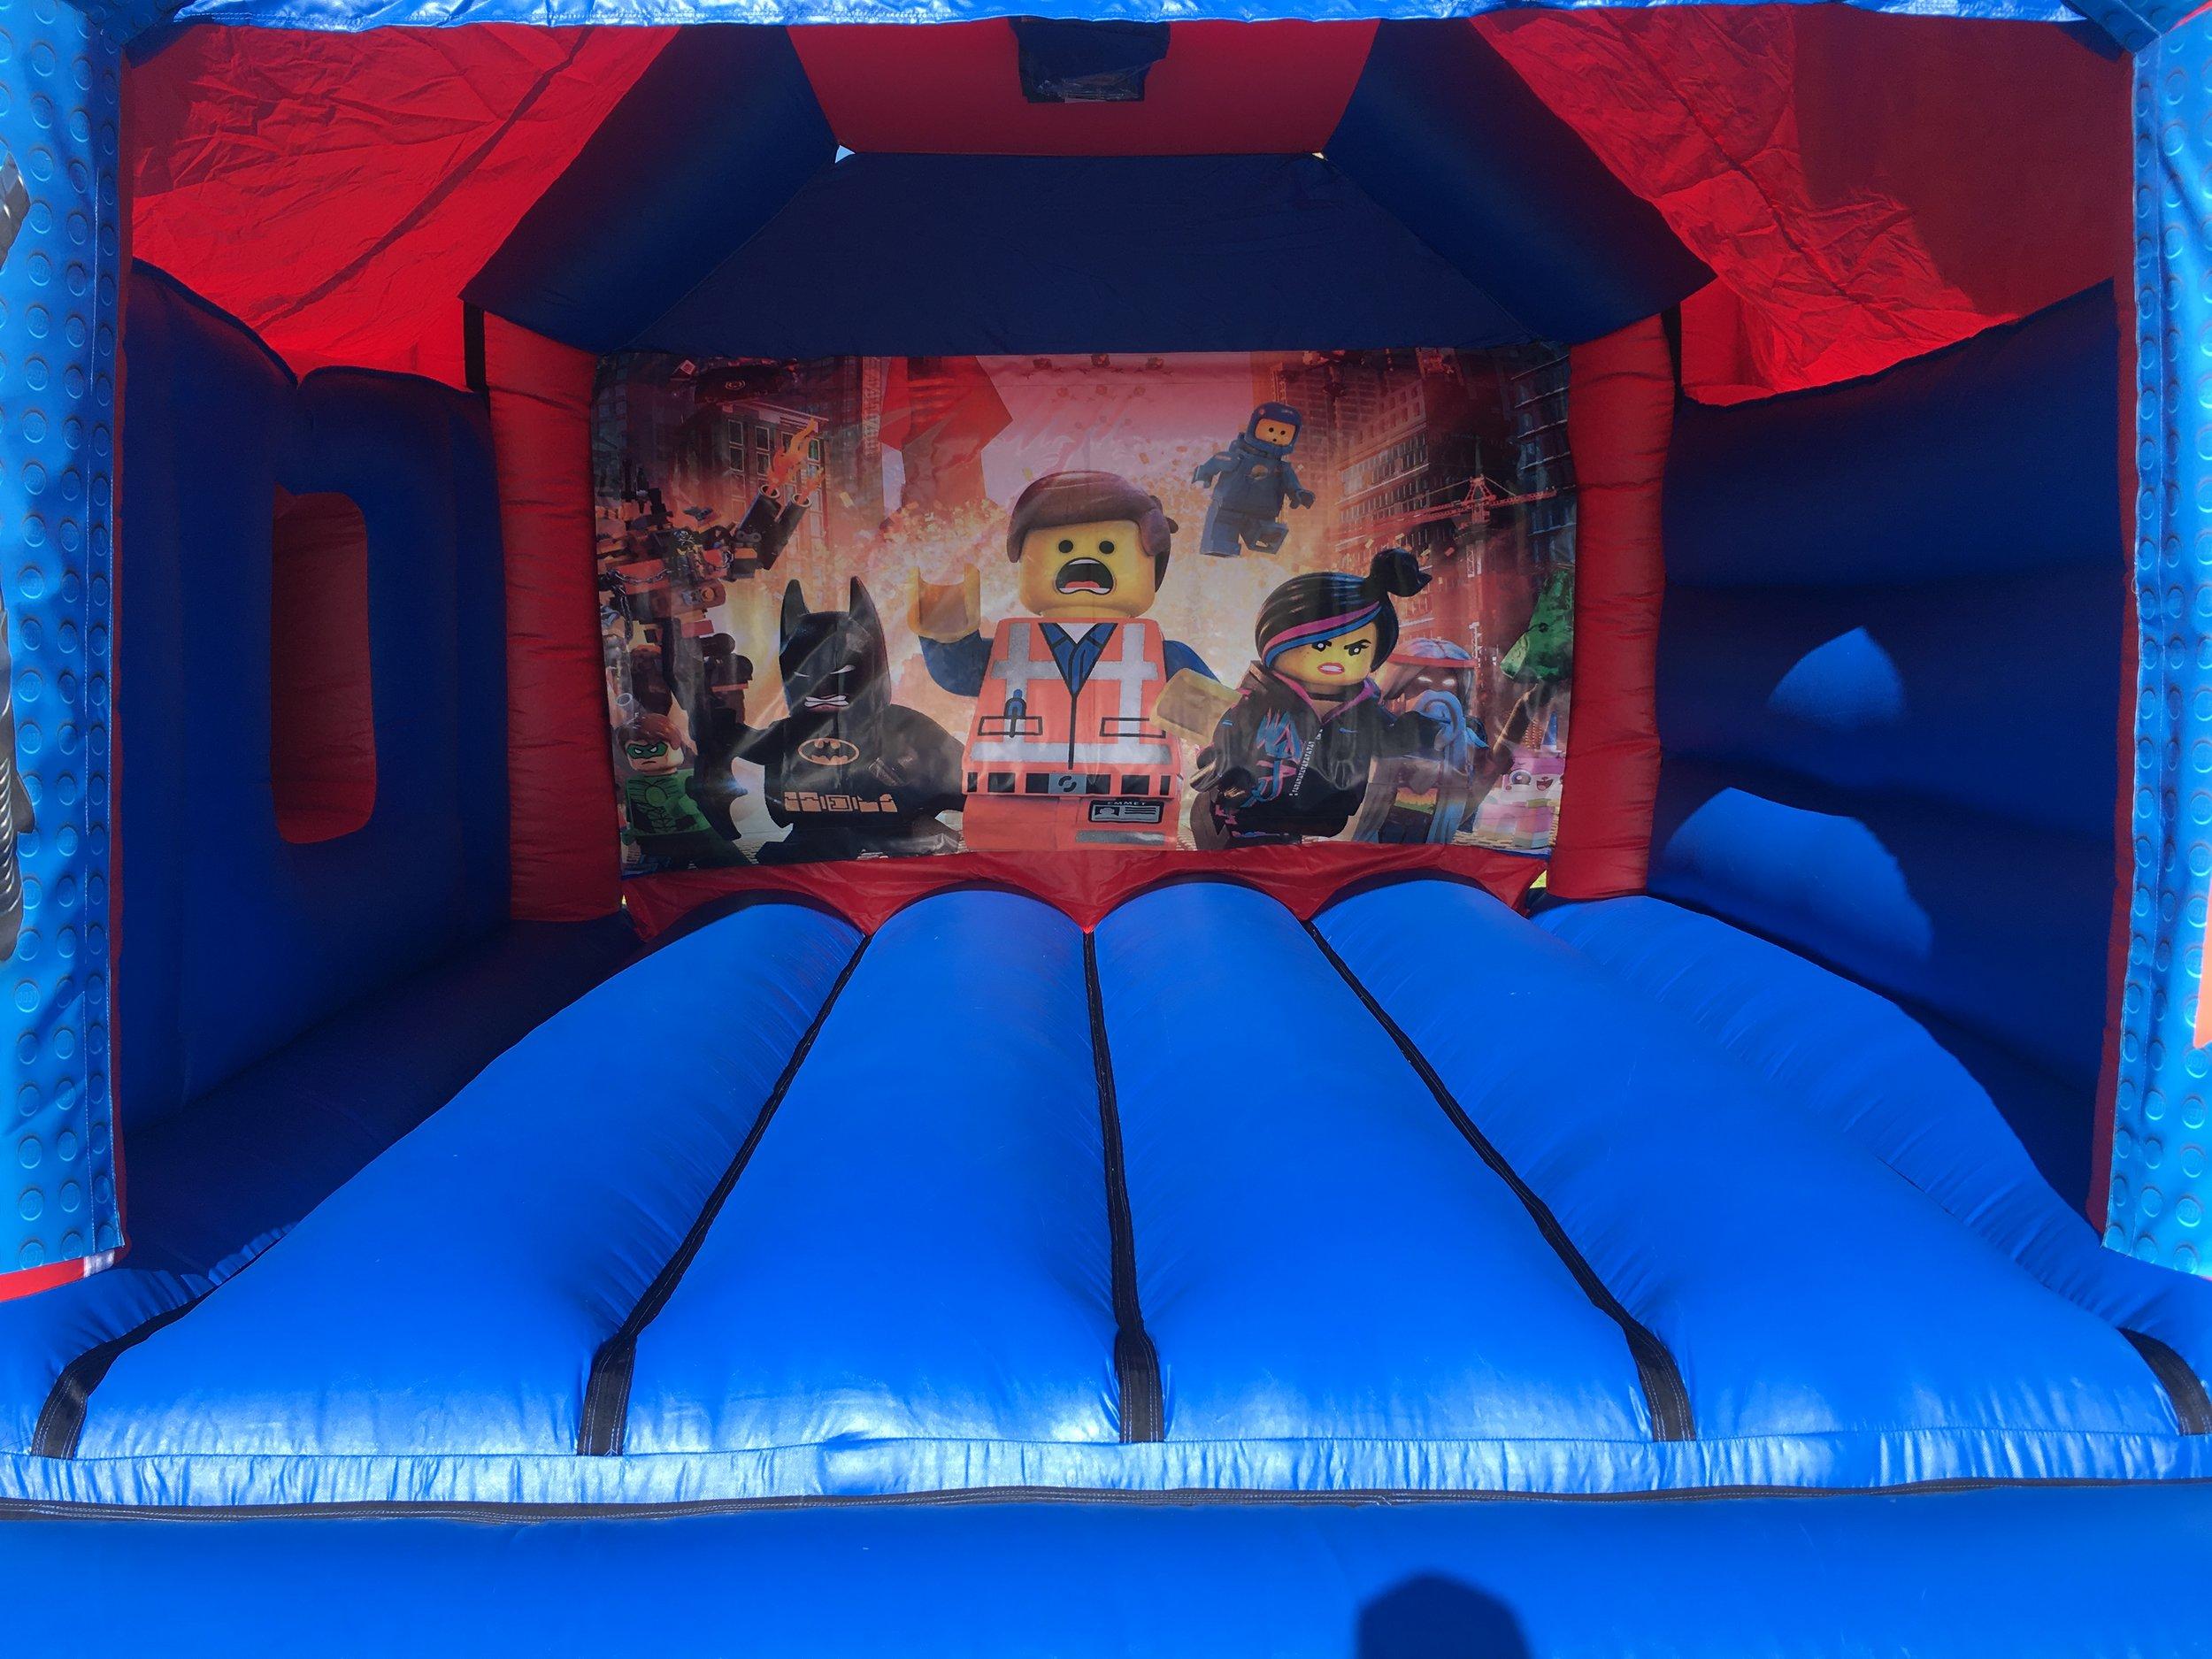 Lego Bouncy Castle Hire With Slide Mandurah